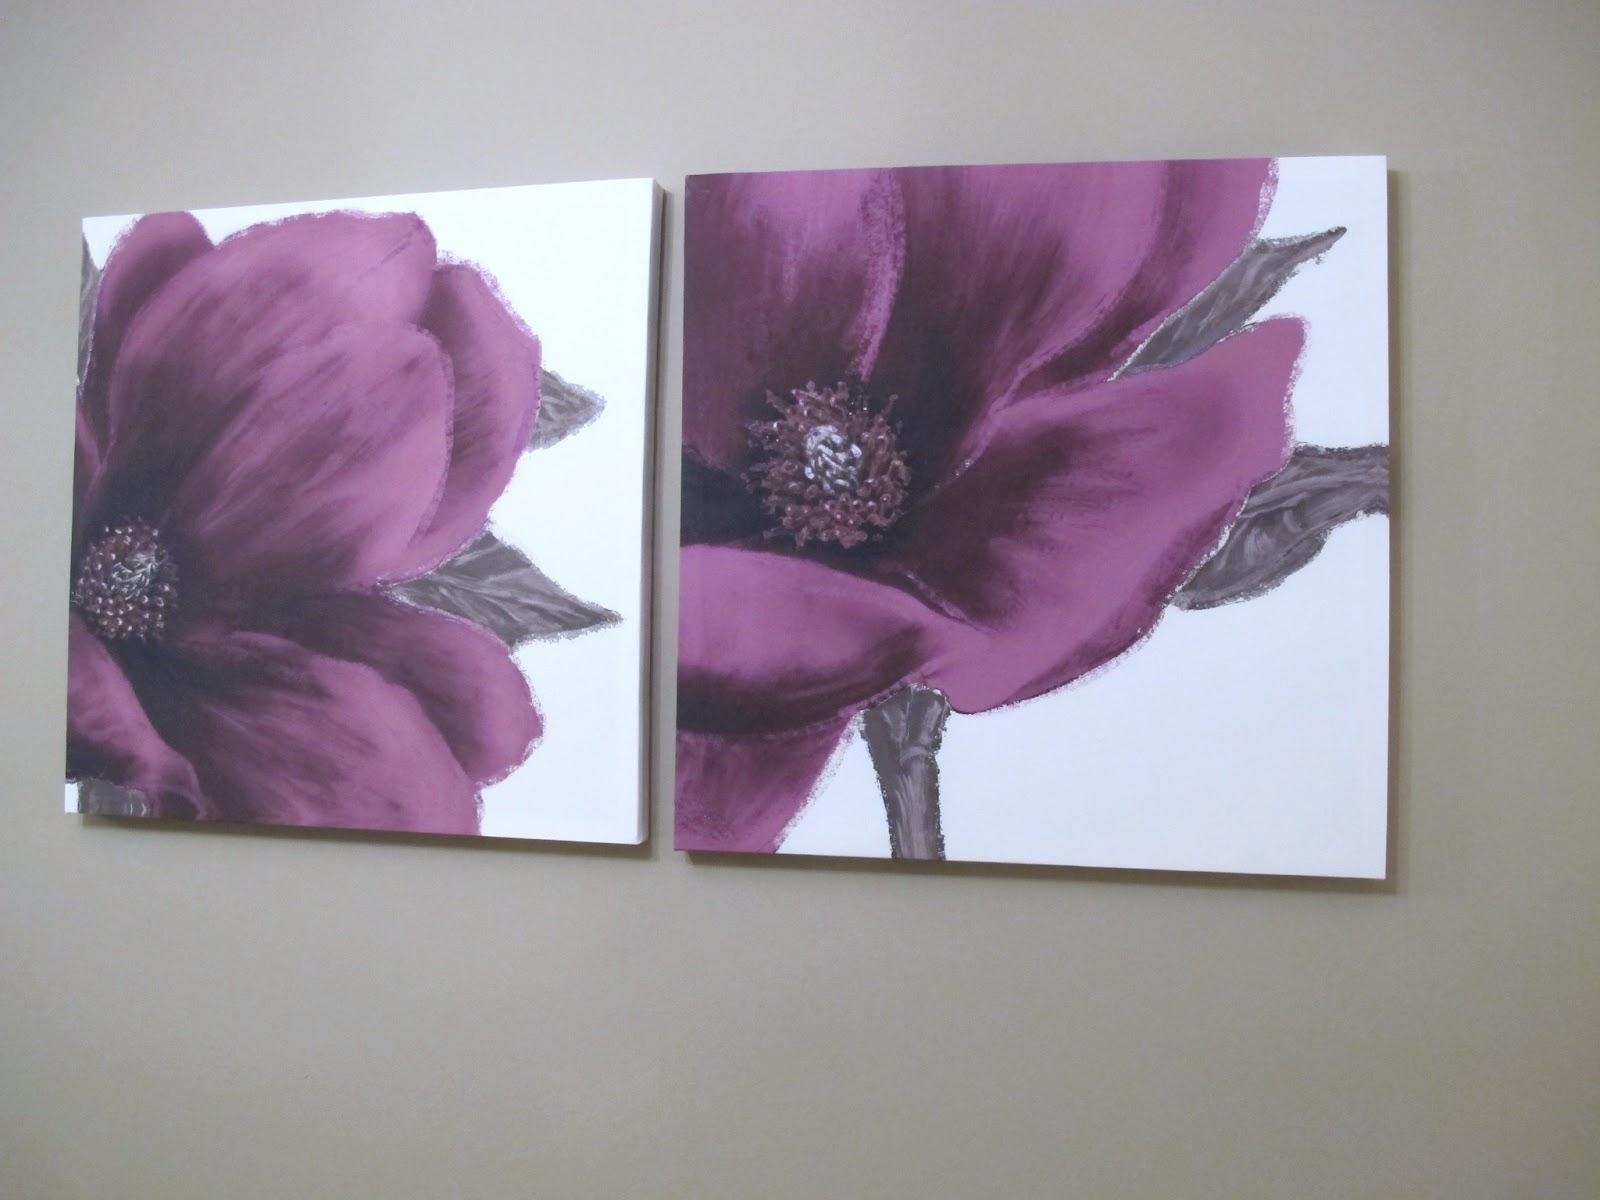 Plum Wall Art Canvas I Wall Decal & Plum Canvas Wall Art - Elitflat